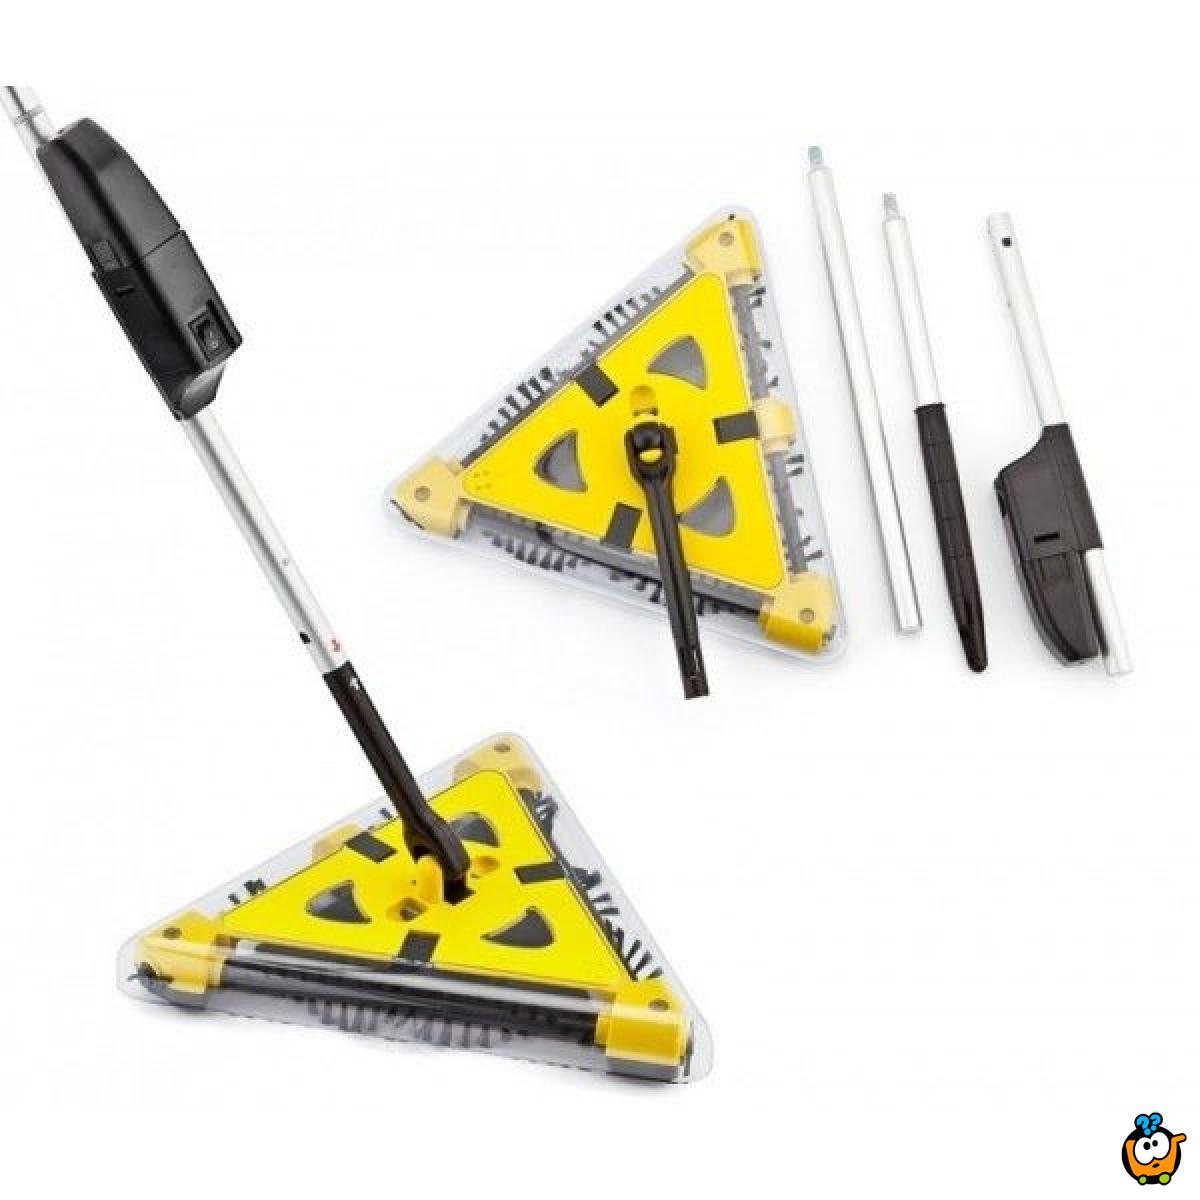 Twister Sweeper - Trouglasti super bežični usisivač